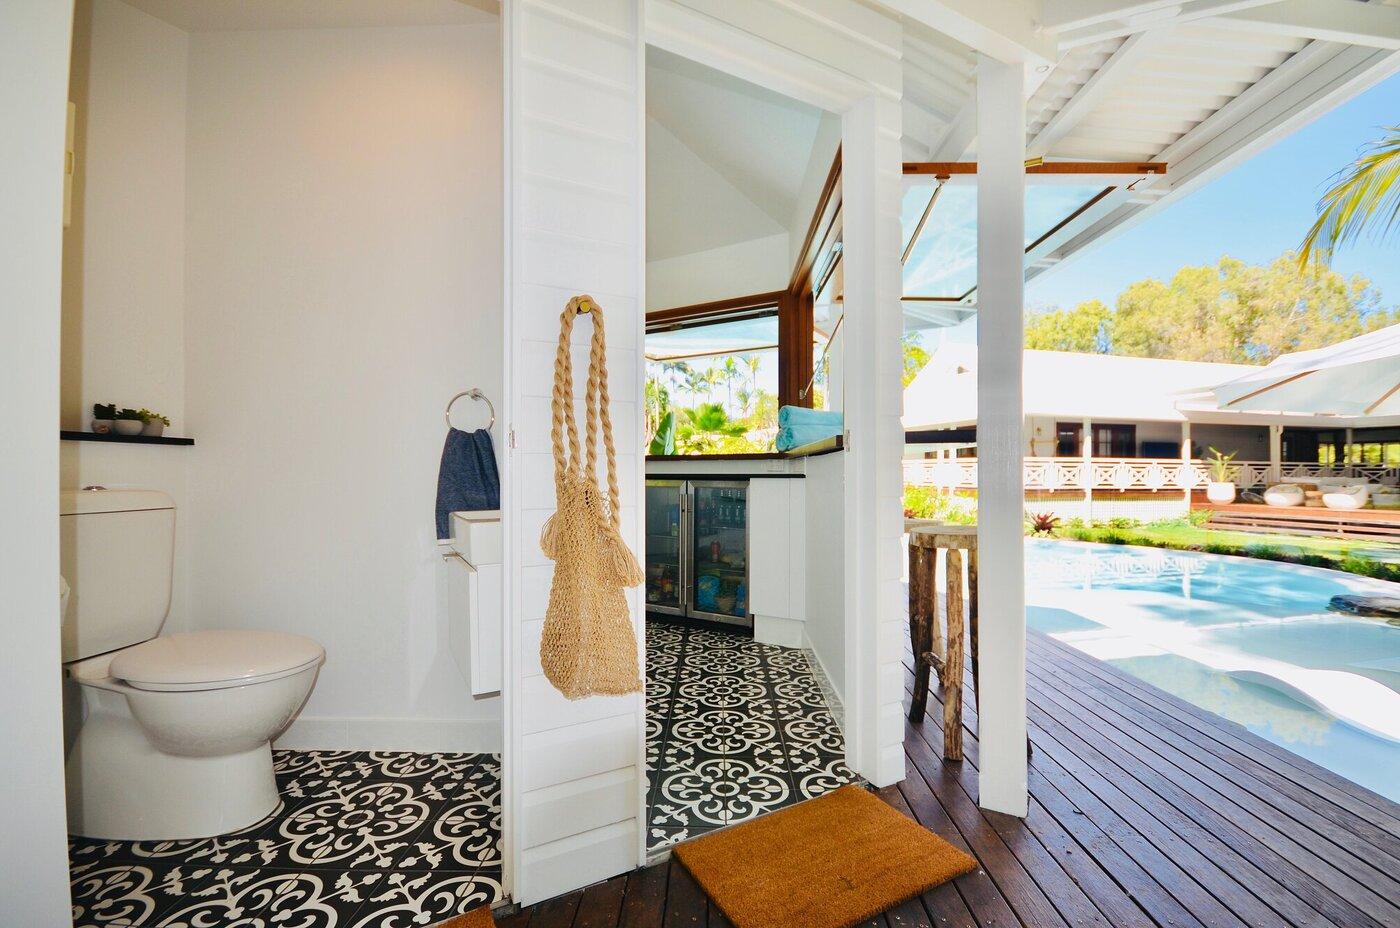 Custom designed pool cabana complete with kitchen & bathroom